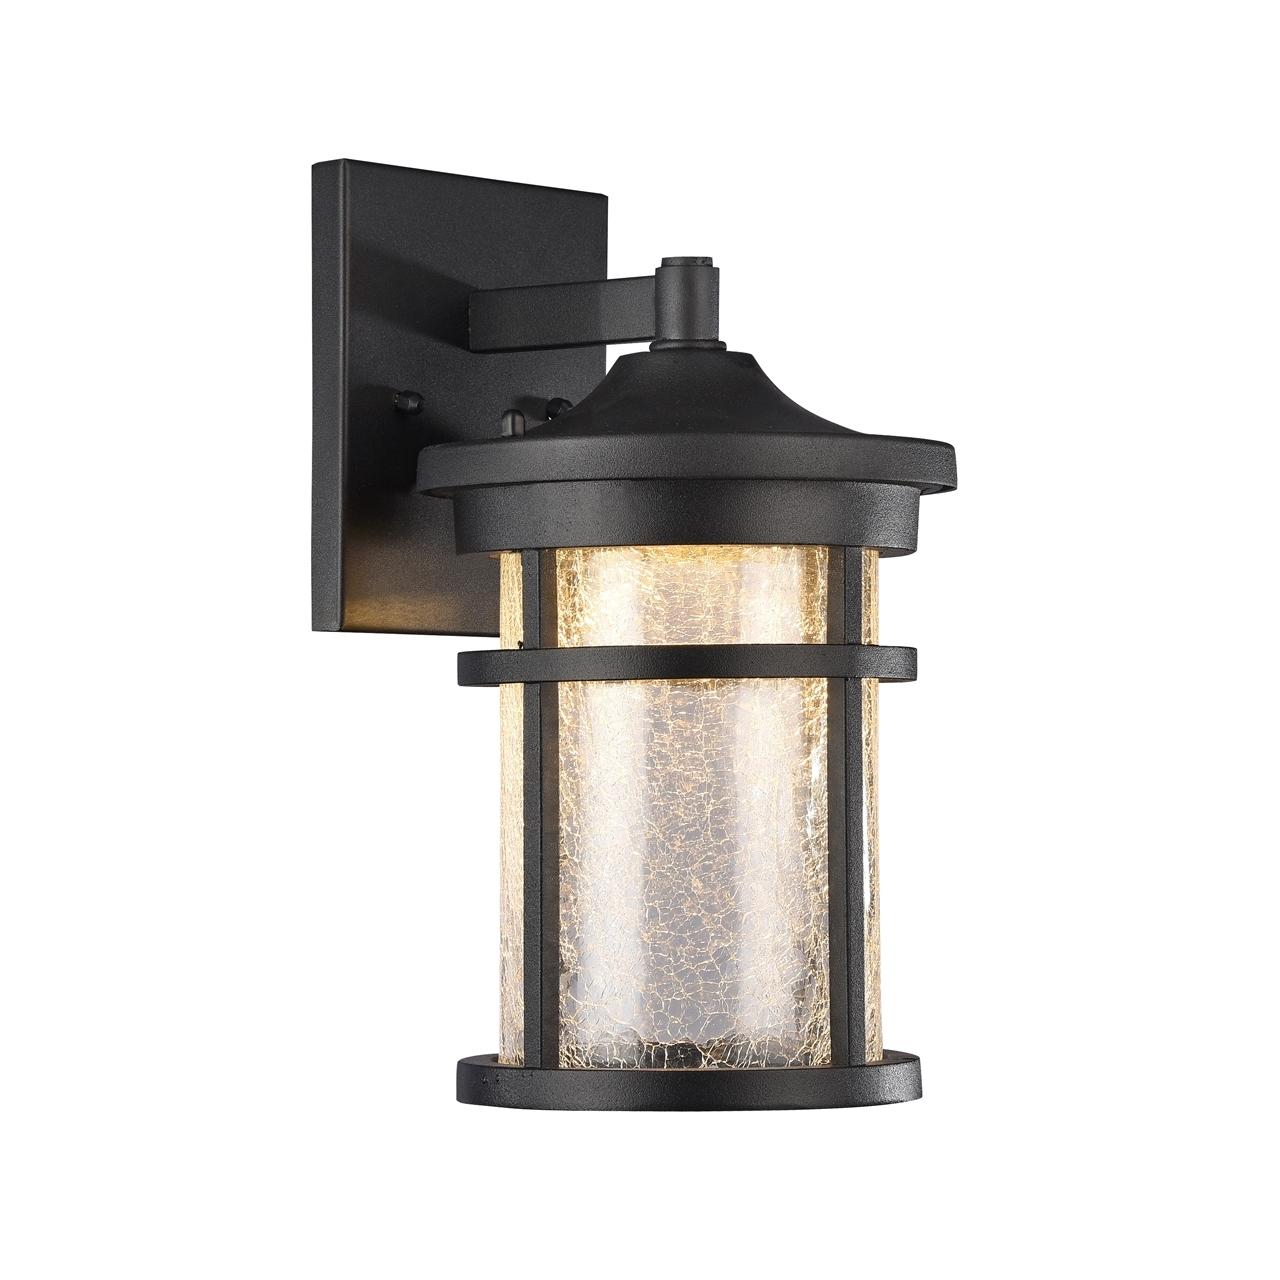 CHLOE Lighting, Inc Lighting wholesale, Lighting ... on Led Sconce Lighting id=83583